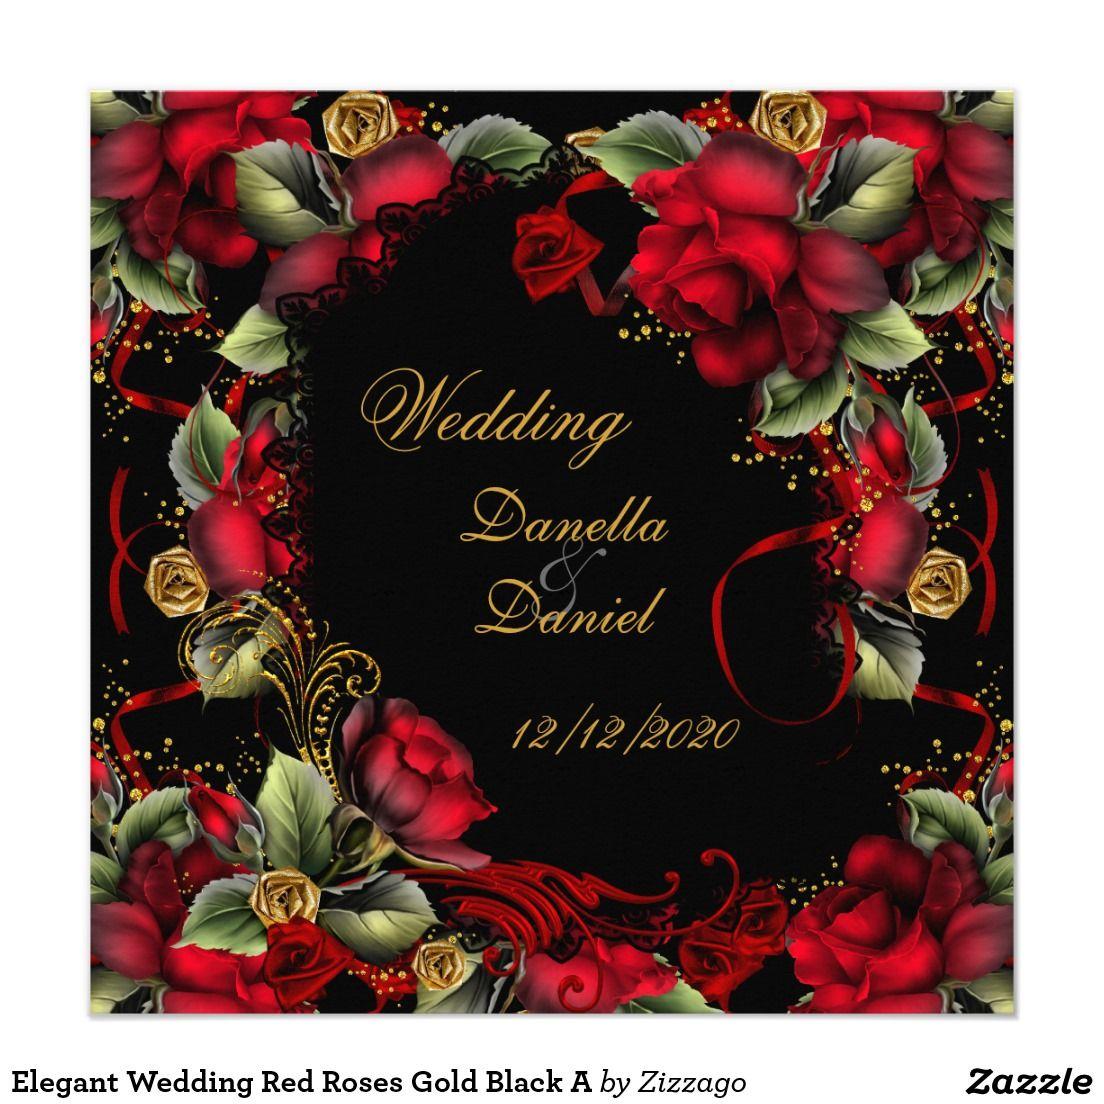 Elegant Wedding Red Roses Gold Black A Card   Elegant, Gold weddings ...